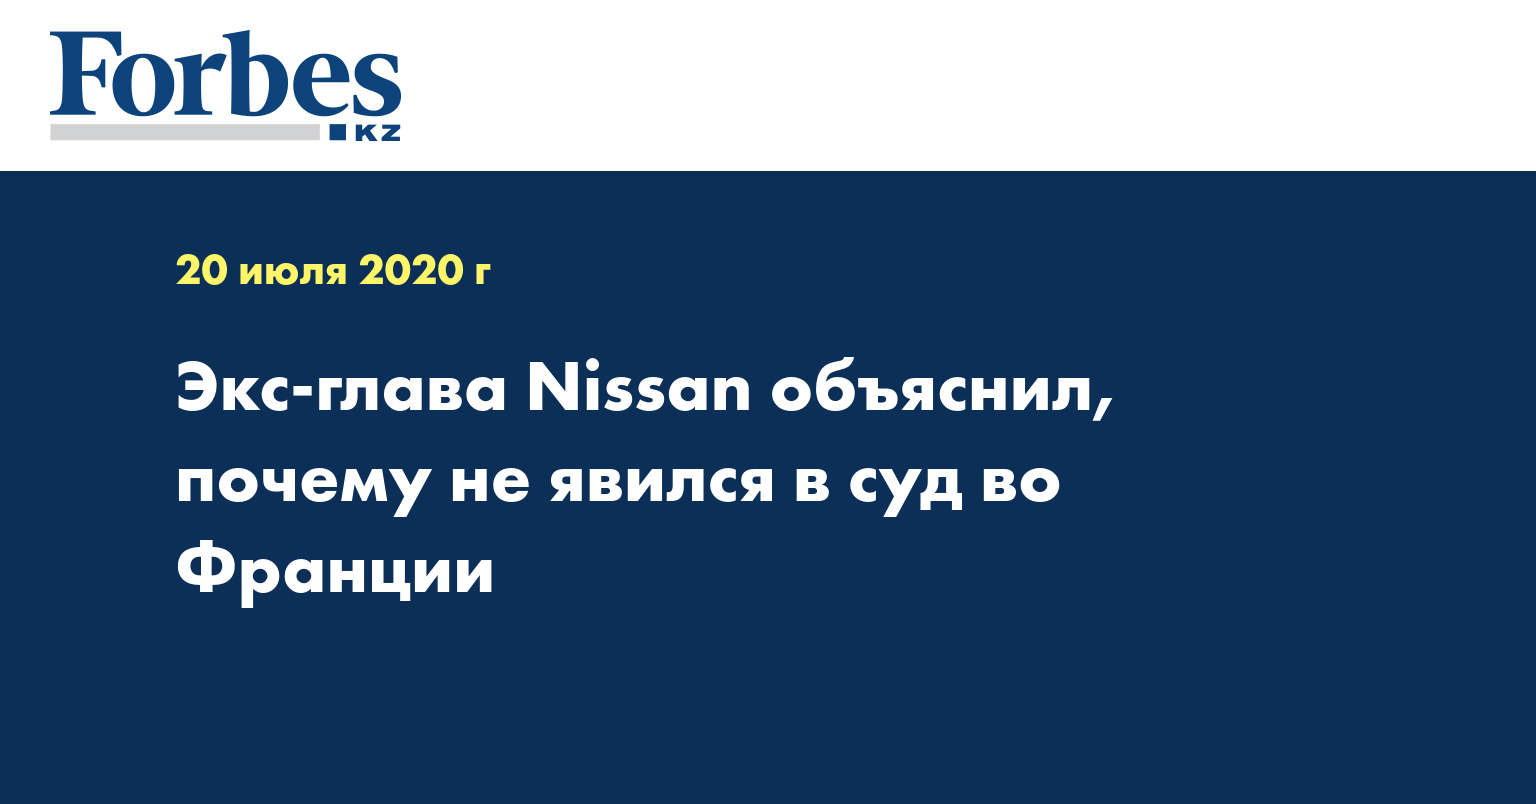 Экс-глава Nissan объяснил, почему не явился в суд во Франции